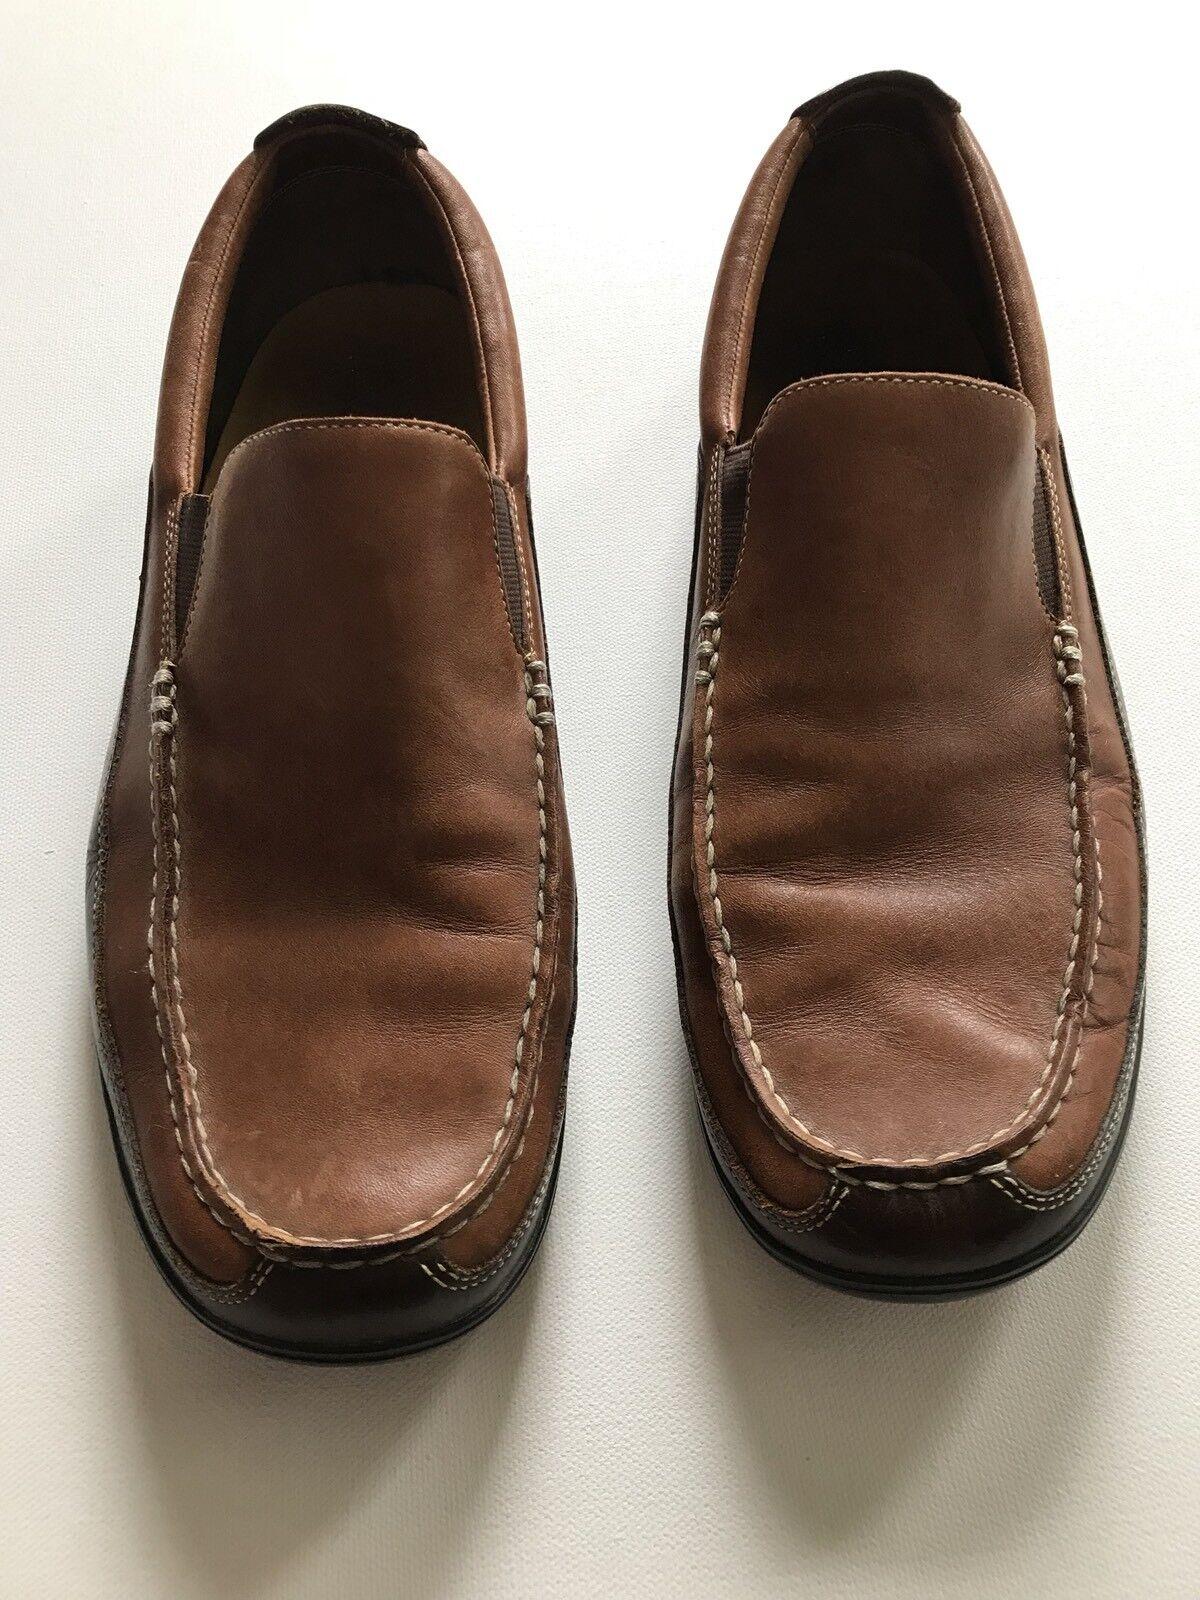 Cole Haan Two Tone Leather Slip M On Venetian Loafer 11.5 M Slip Cognac & Walnut Luxury e9c3a9